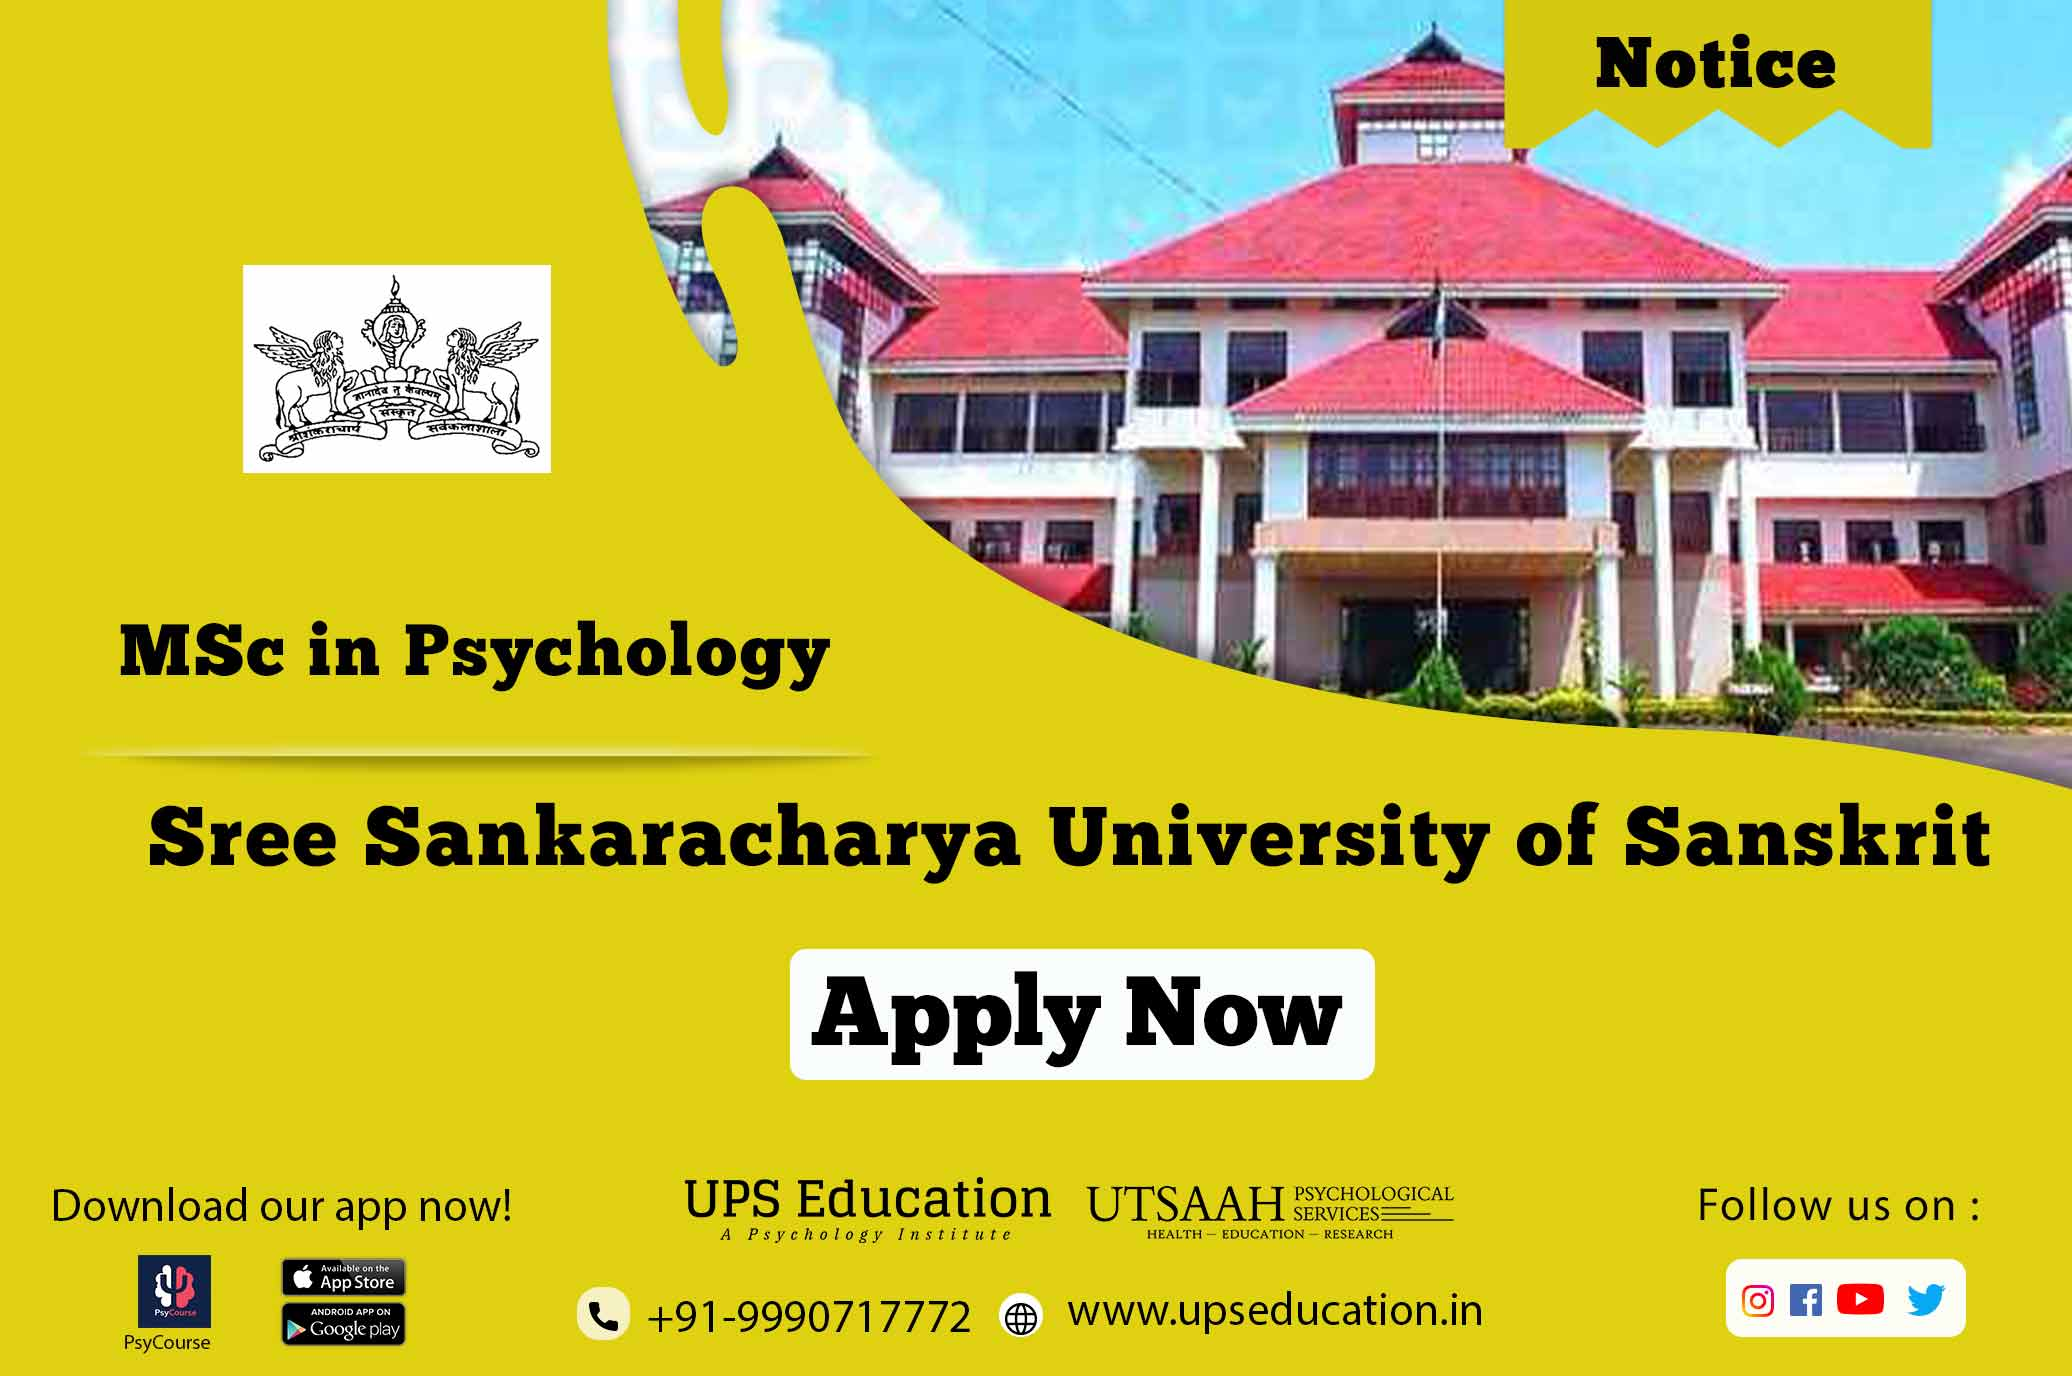 Sree Sankarachary University of Sanskrit, Kalady MSC in Psychology